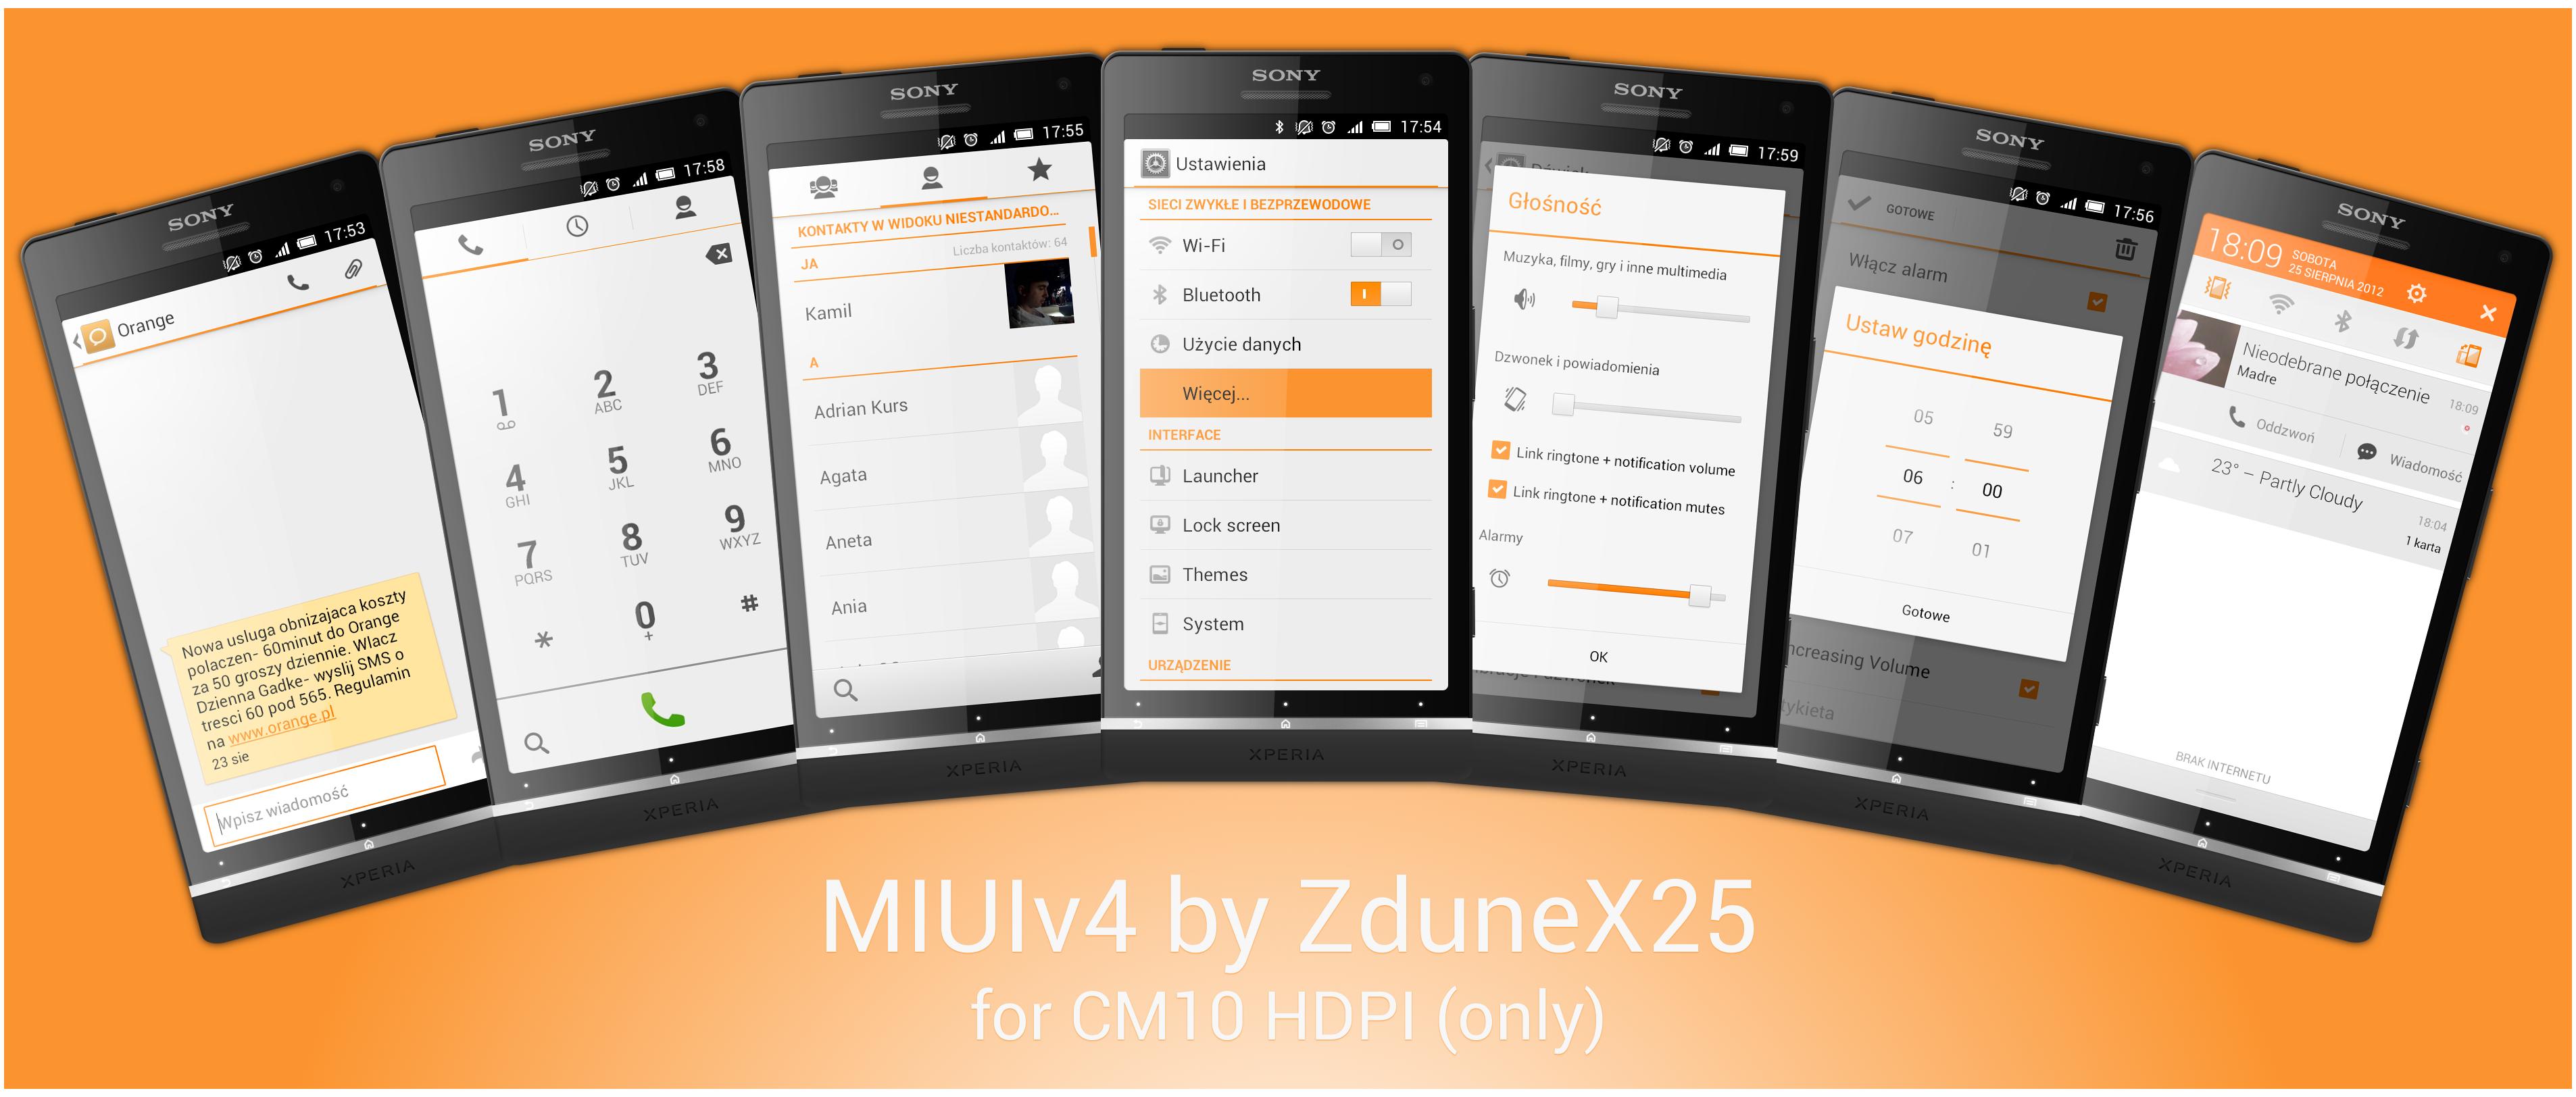 MIUIv4 for CM10 by ZduneX25